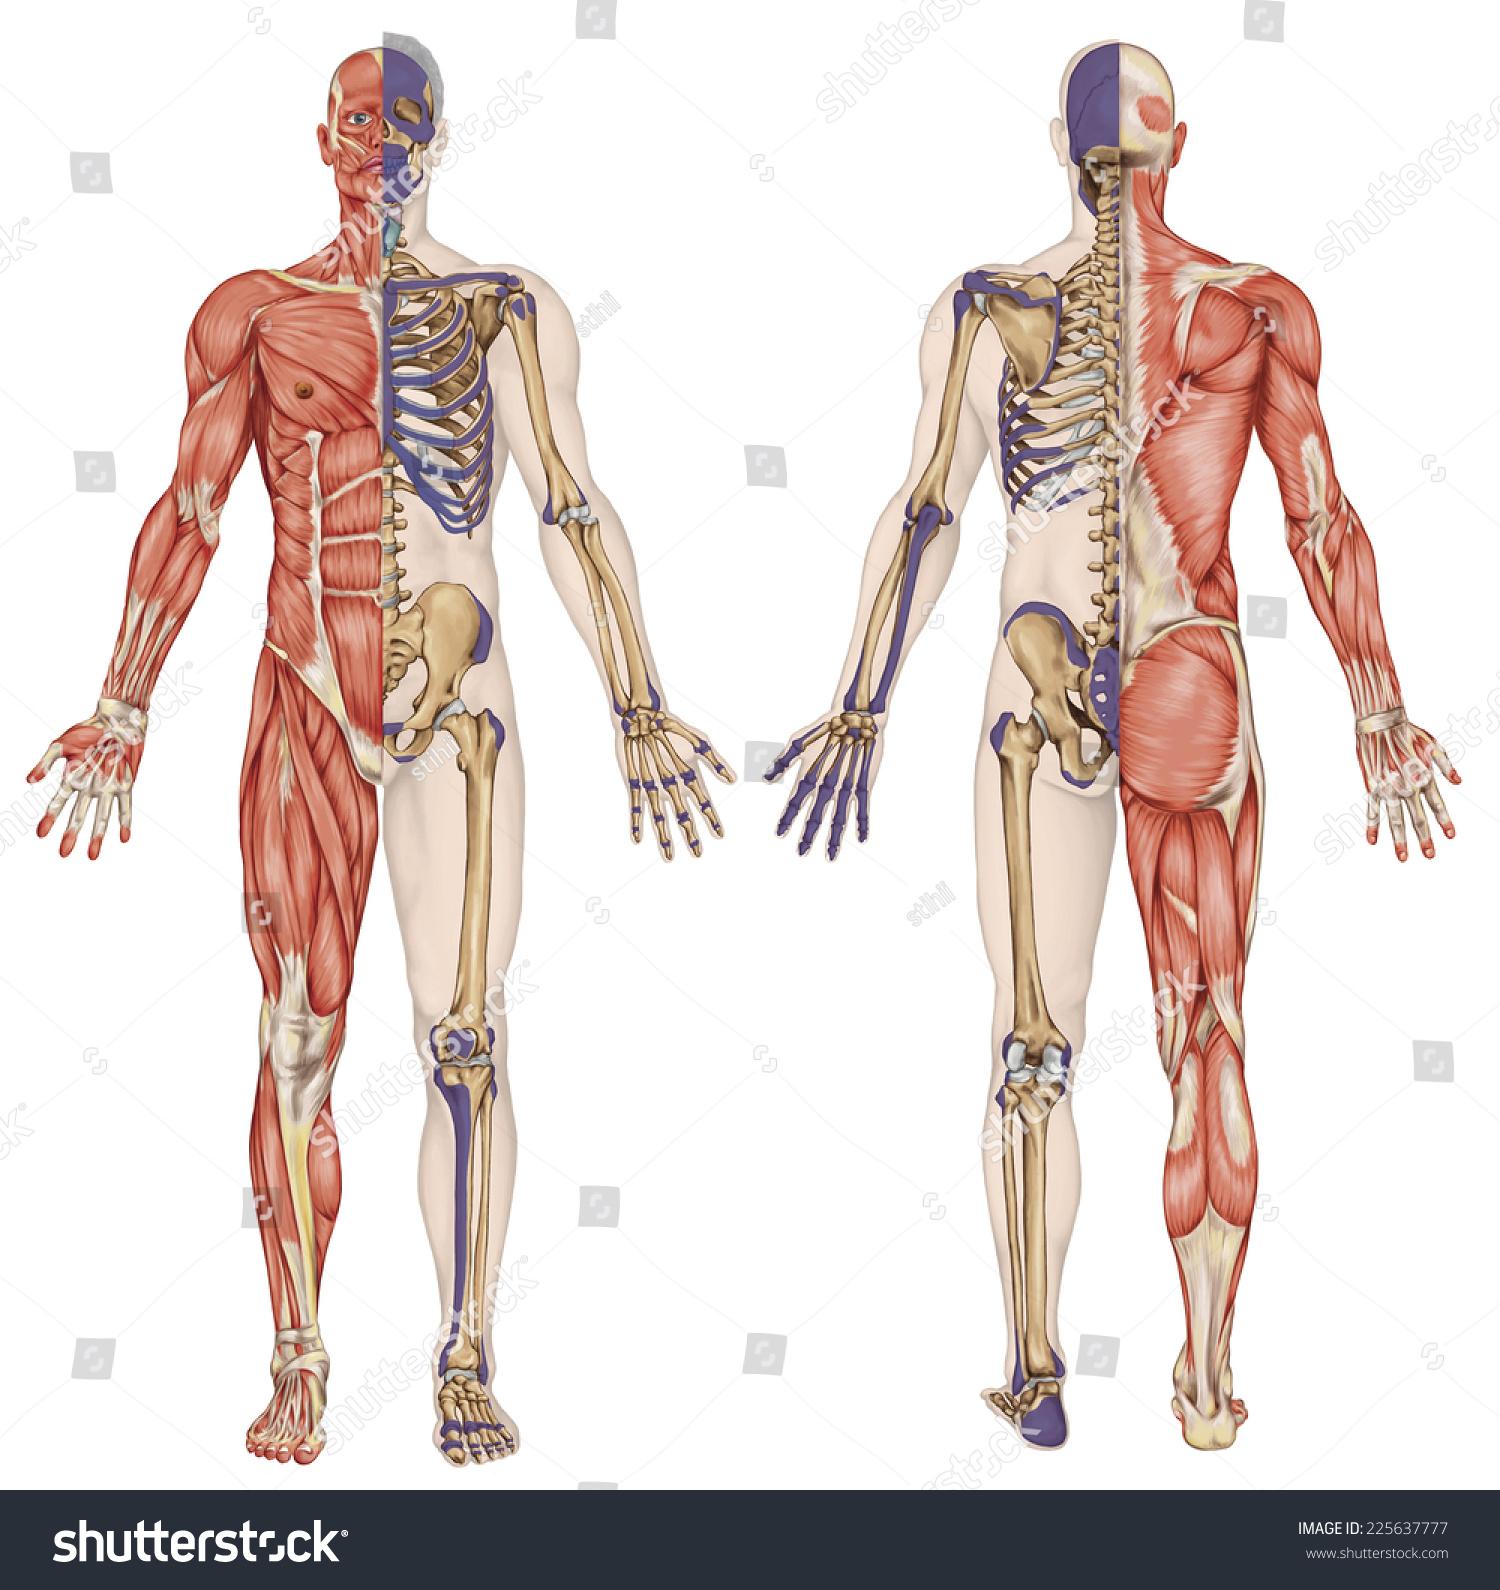 Anatomical Body Human Skeleton Anatomy Human Stock Illustration